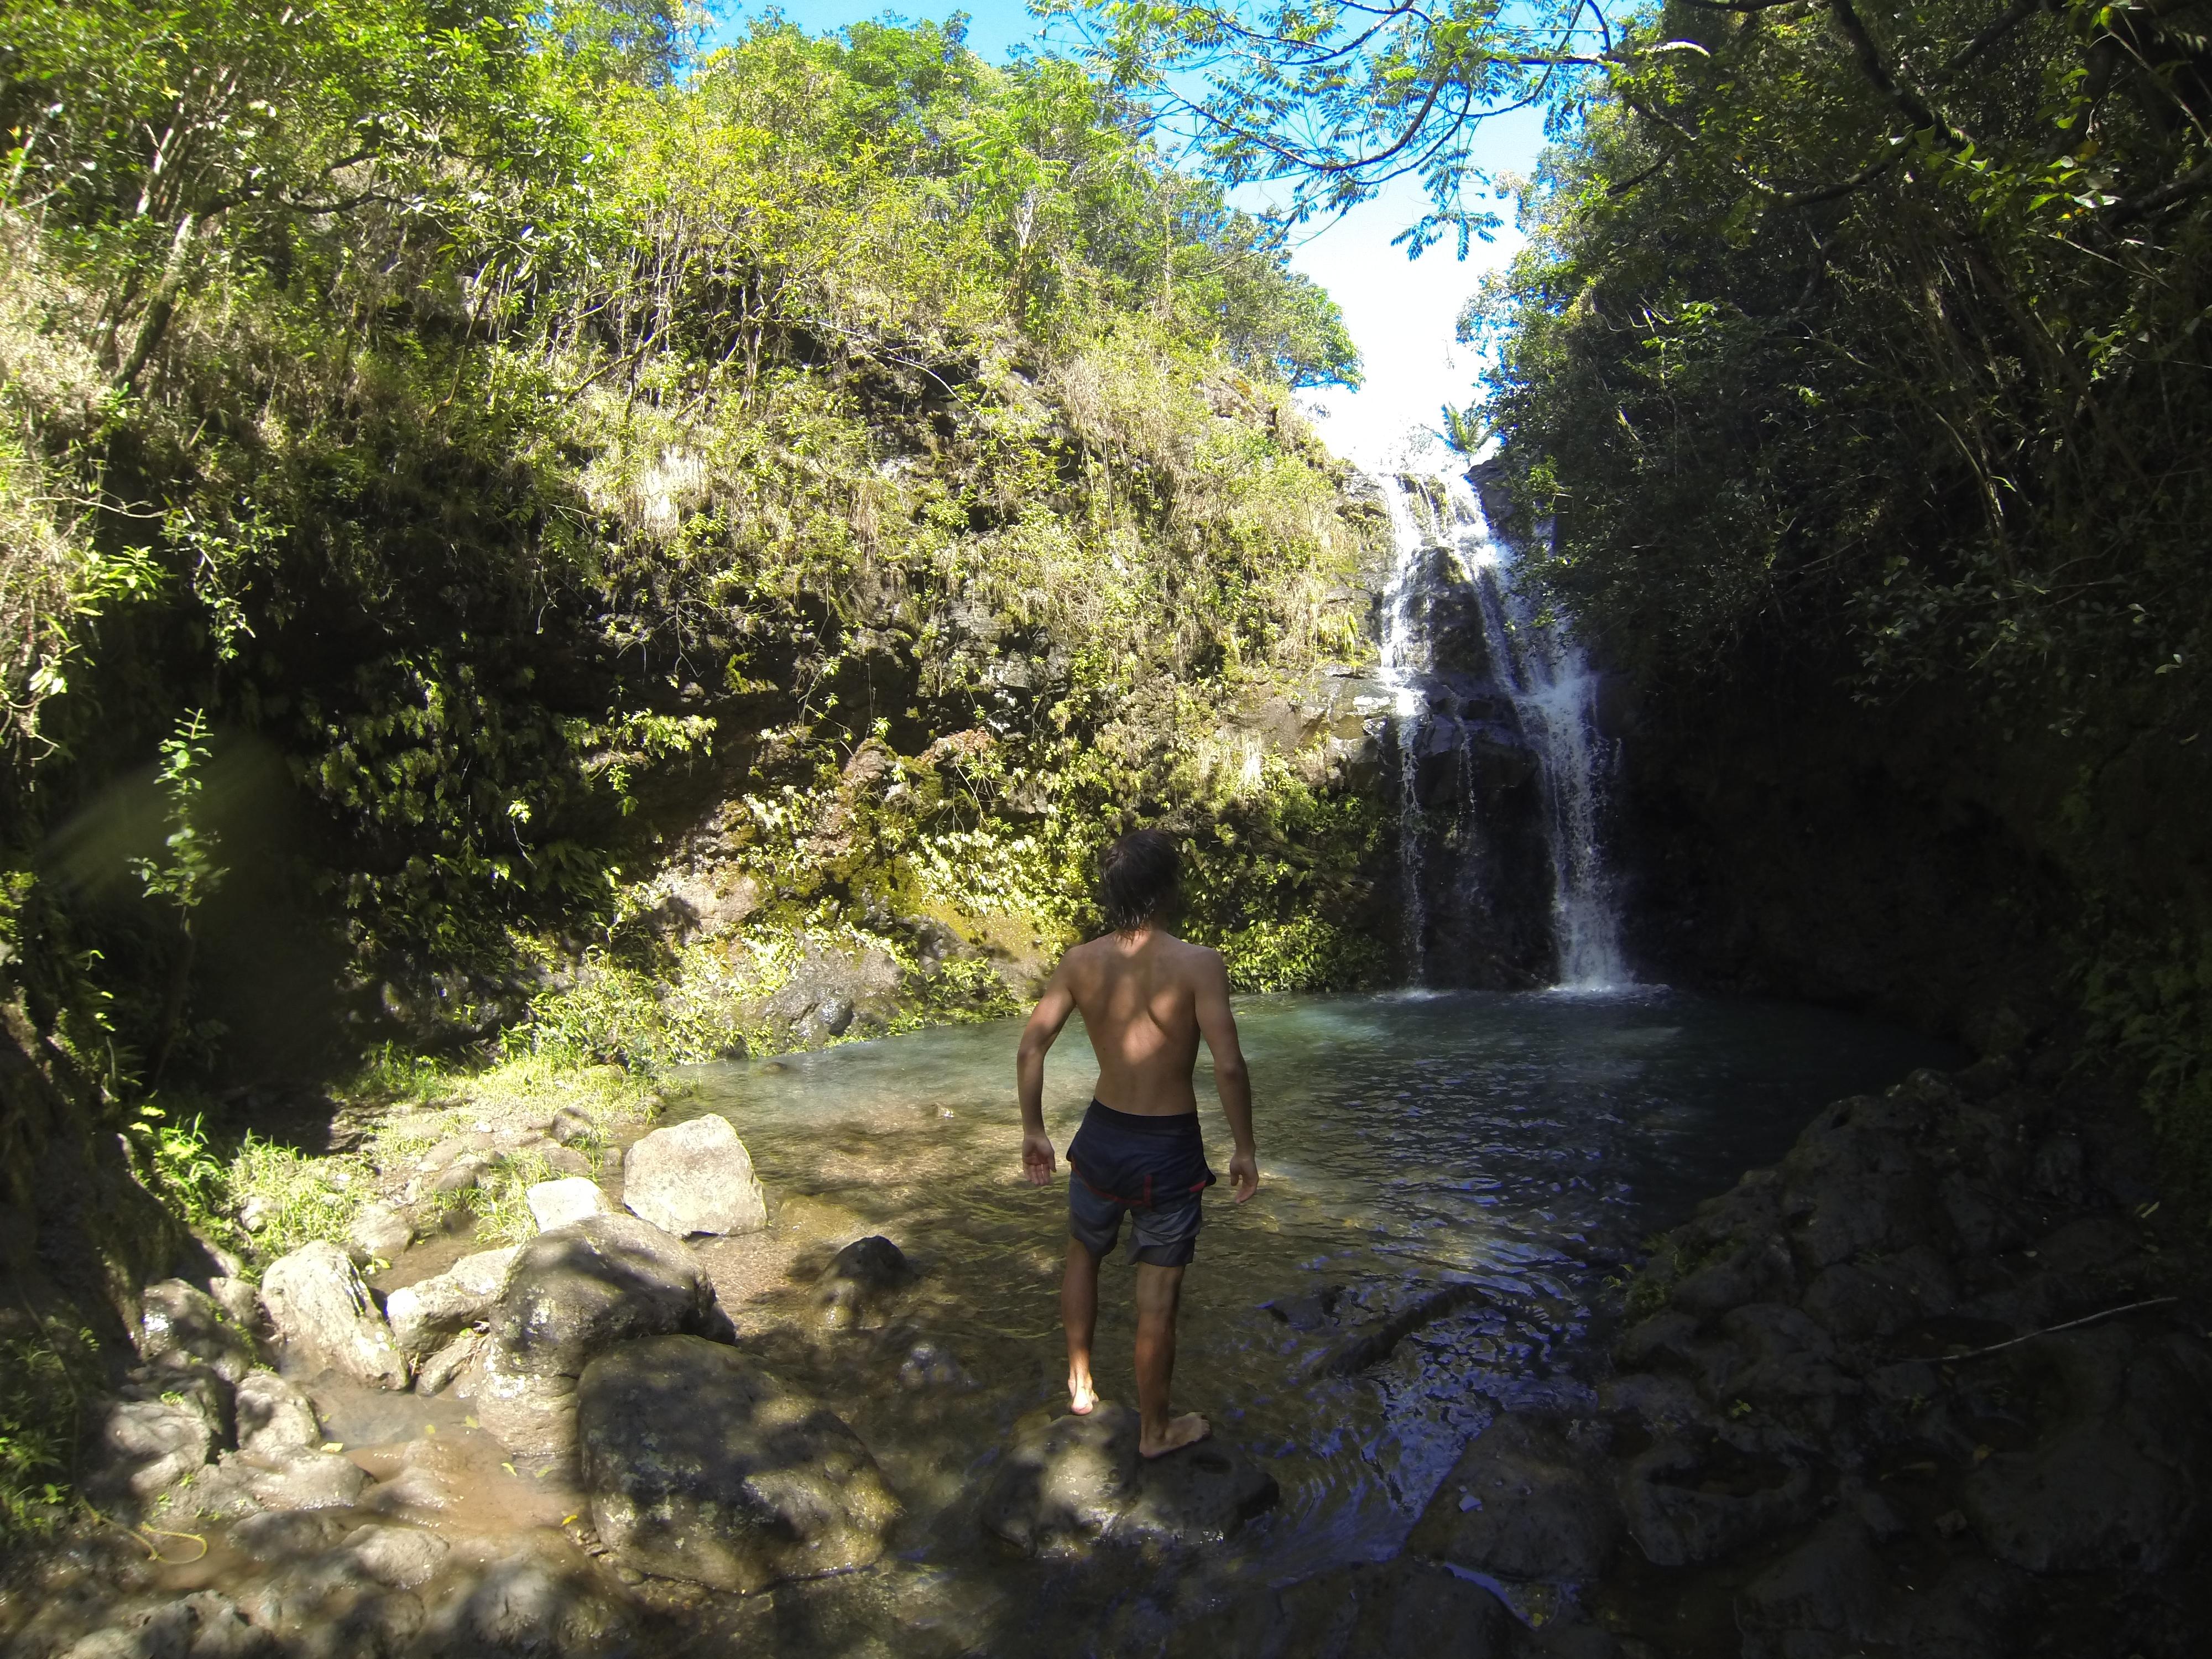 Waimano Falls clipart #18, Download drawings